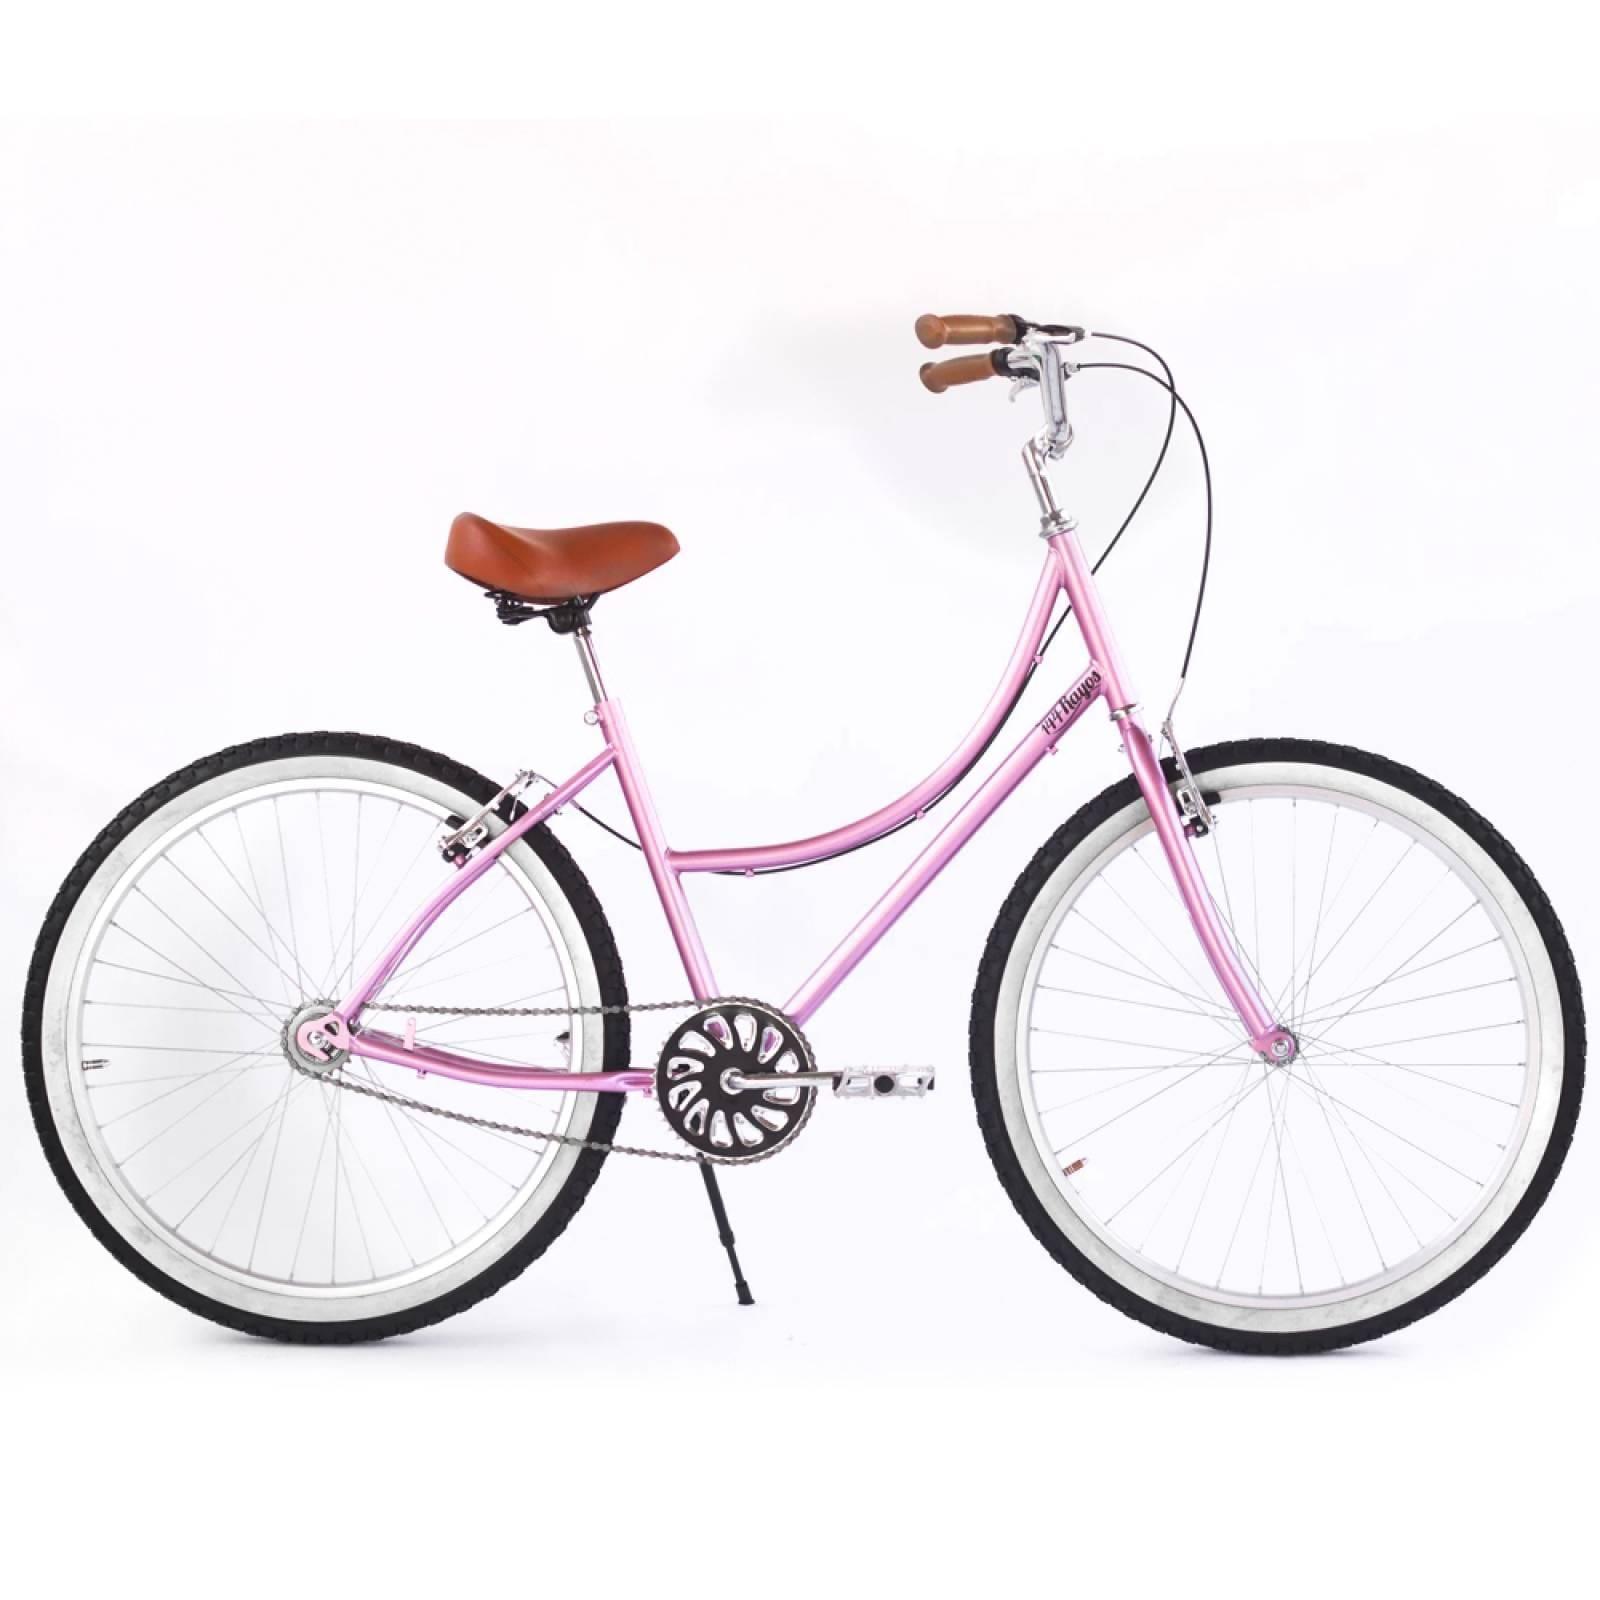 Bicicleta Inglesa Rodada 26 Acero Reflejante Aluminio 144 Rayos Bikes